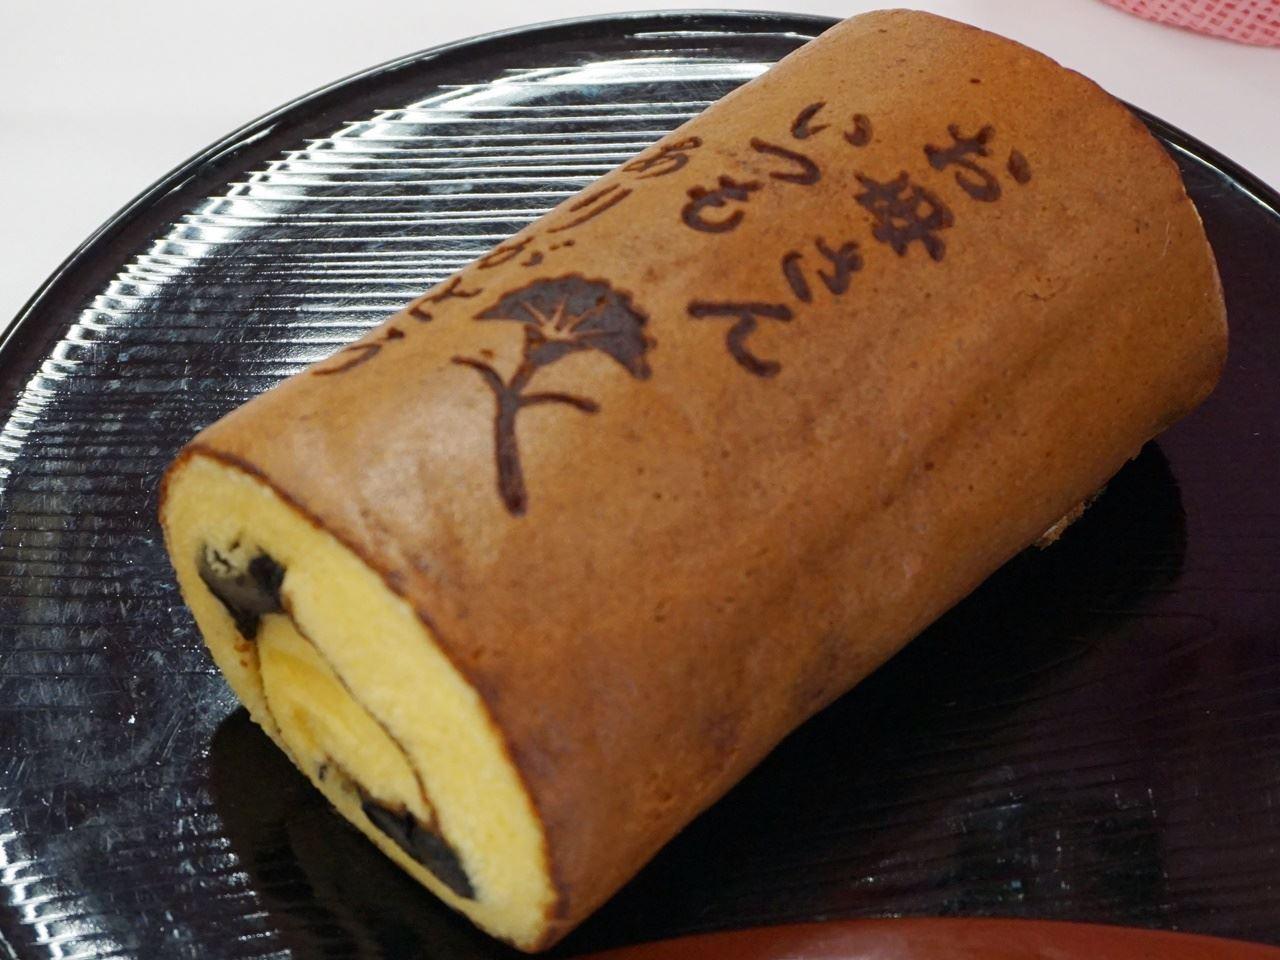 【e87】母の日 鉢植えセットの「京・伏見 三源庵 黒豆ロールカステラ」